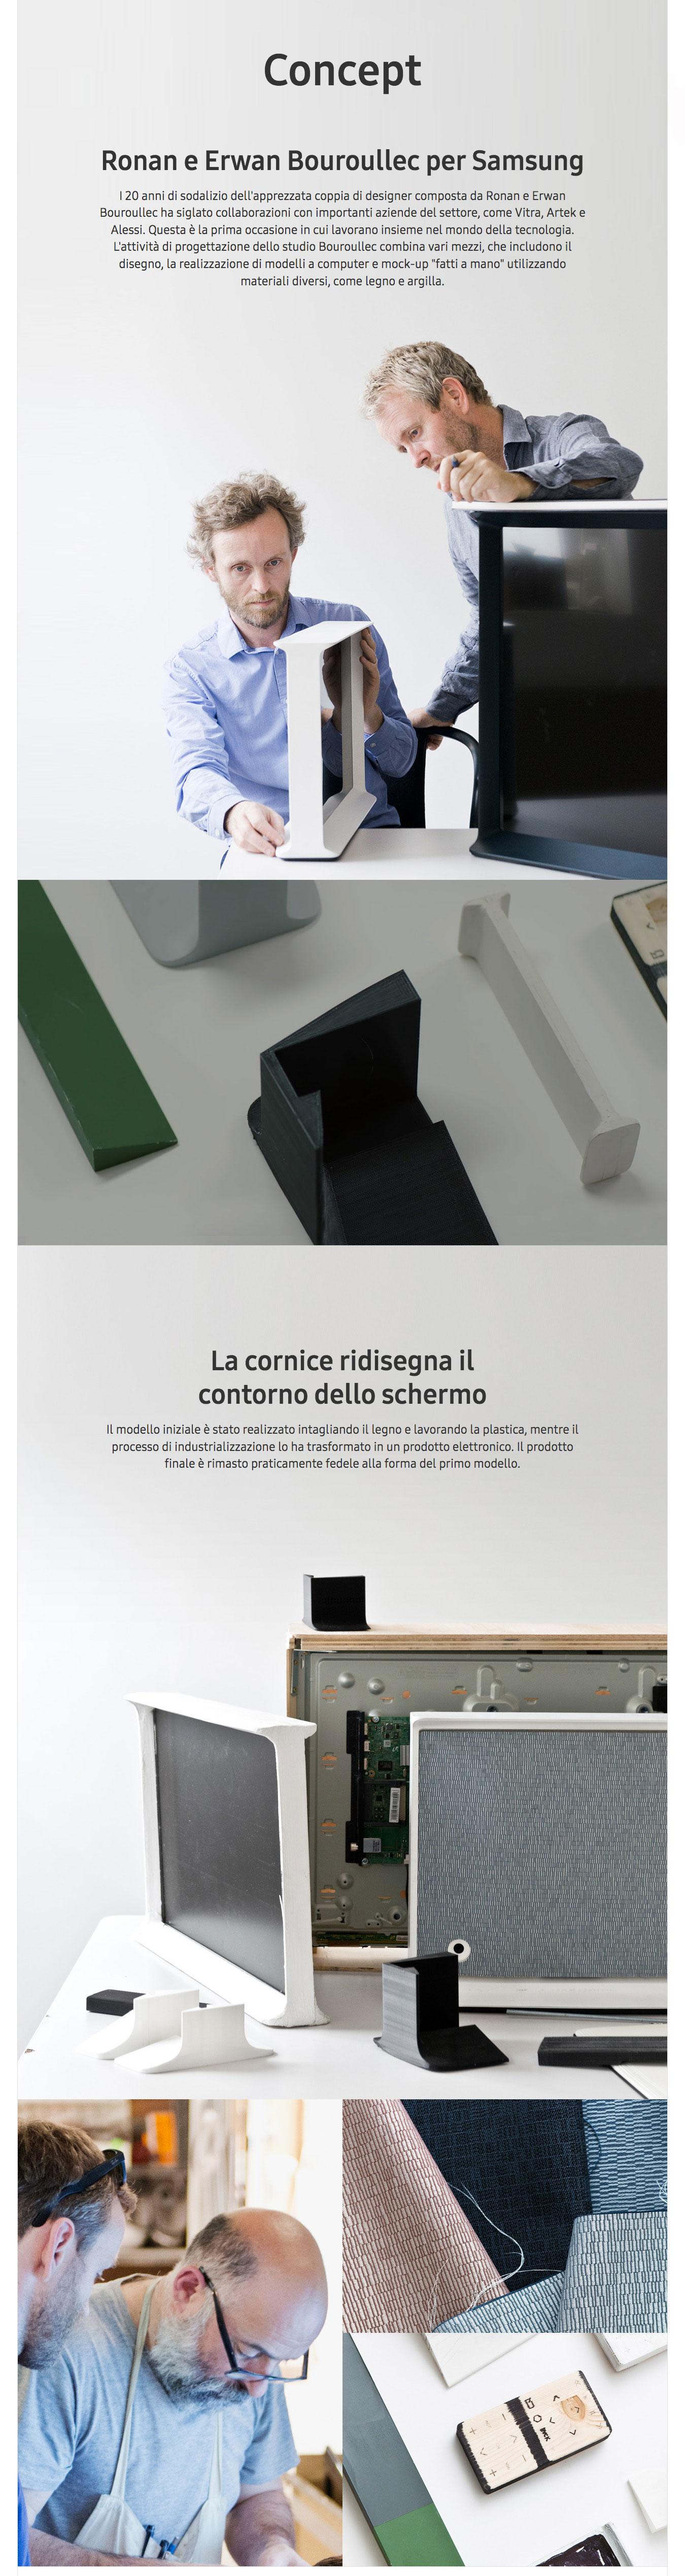 Samsung-Serif-Concept.jpg